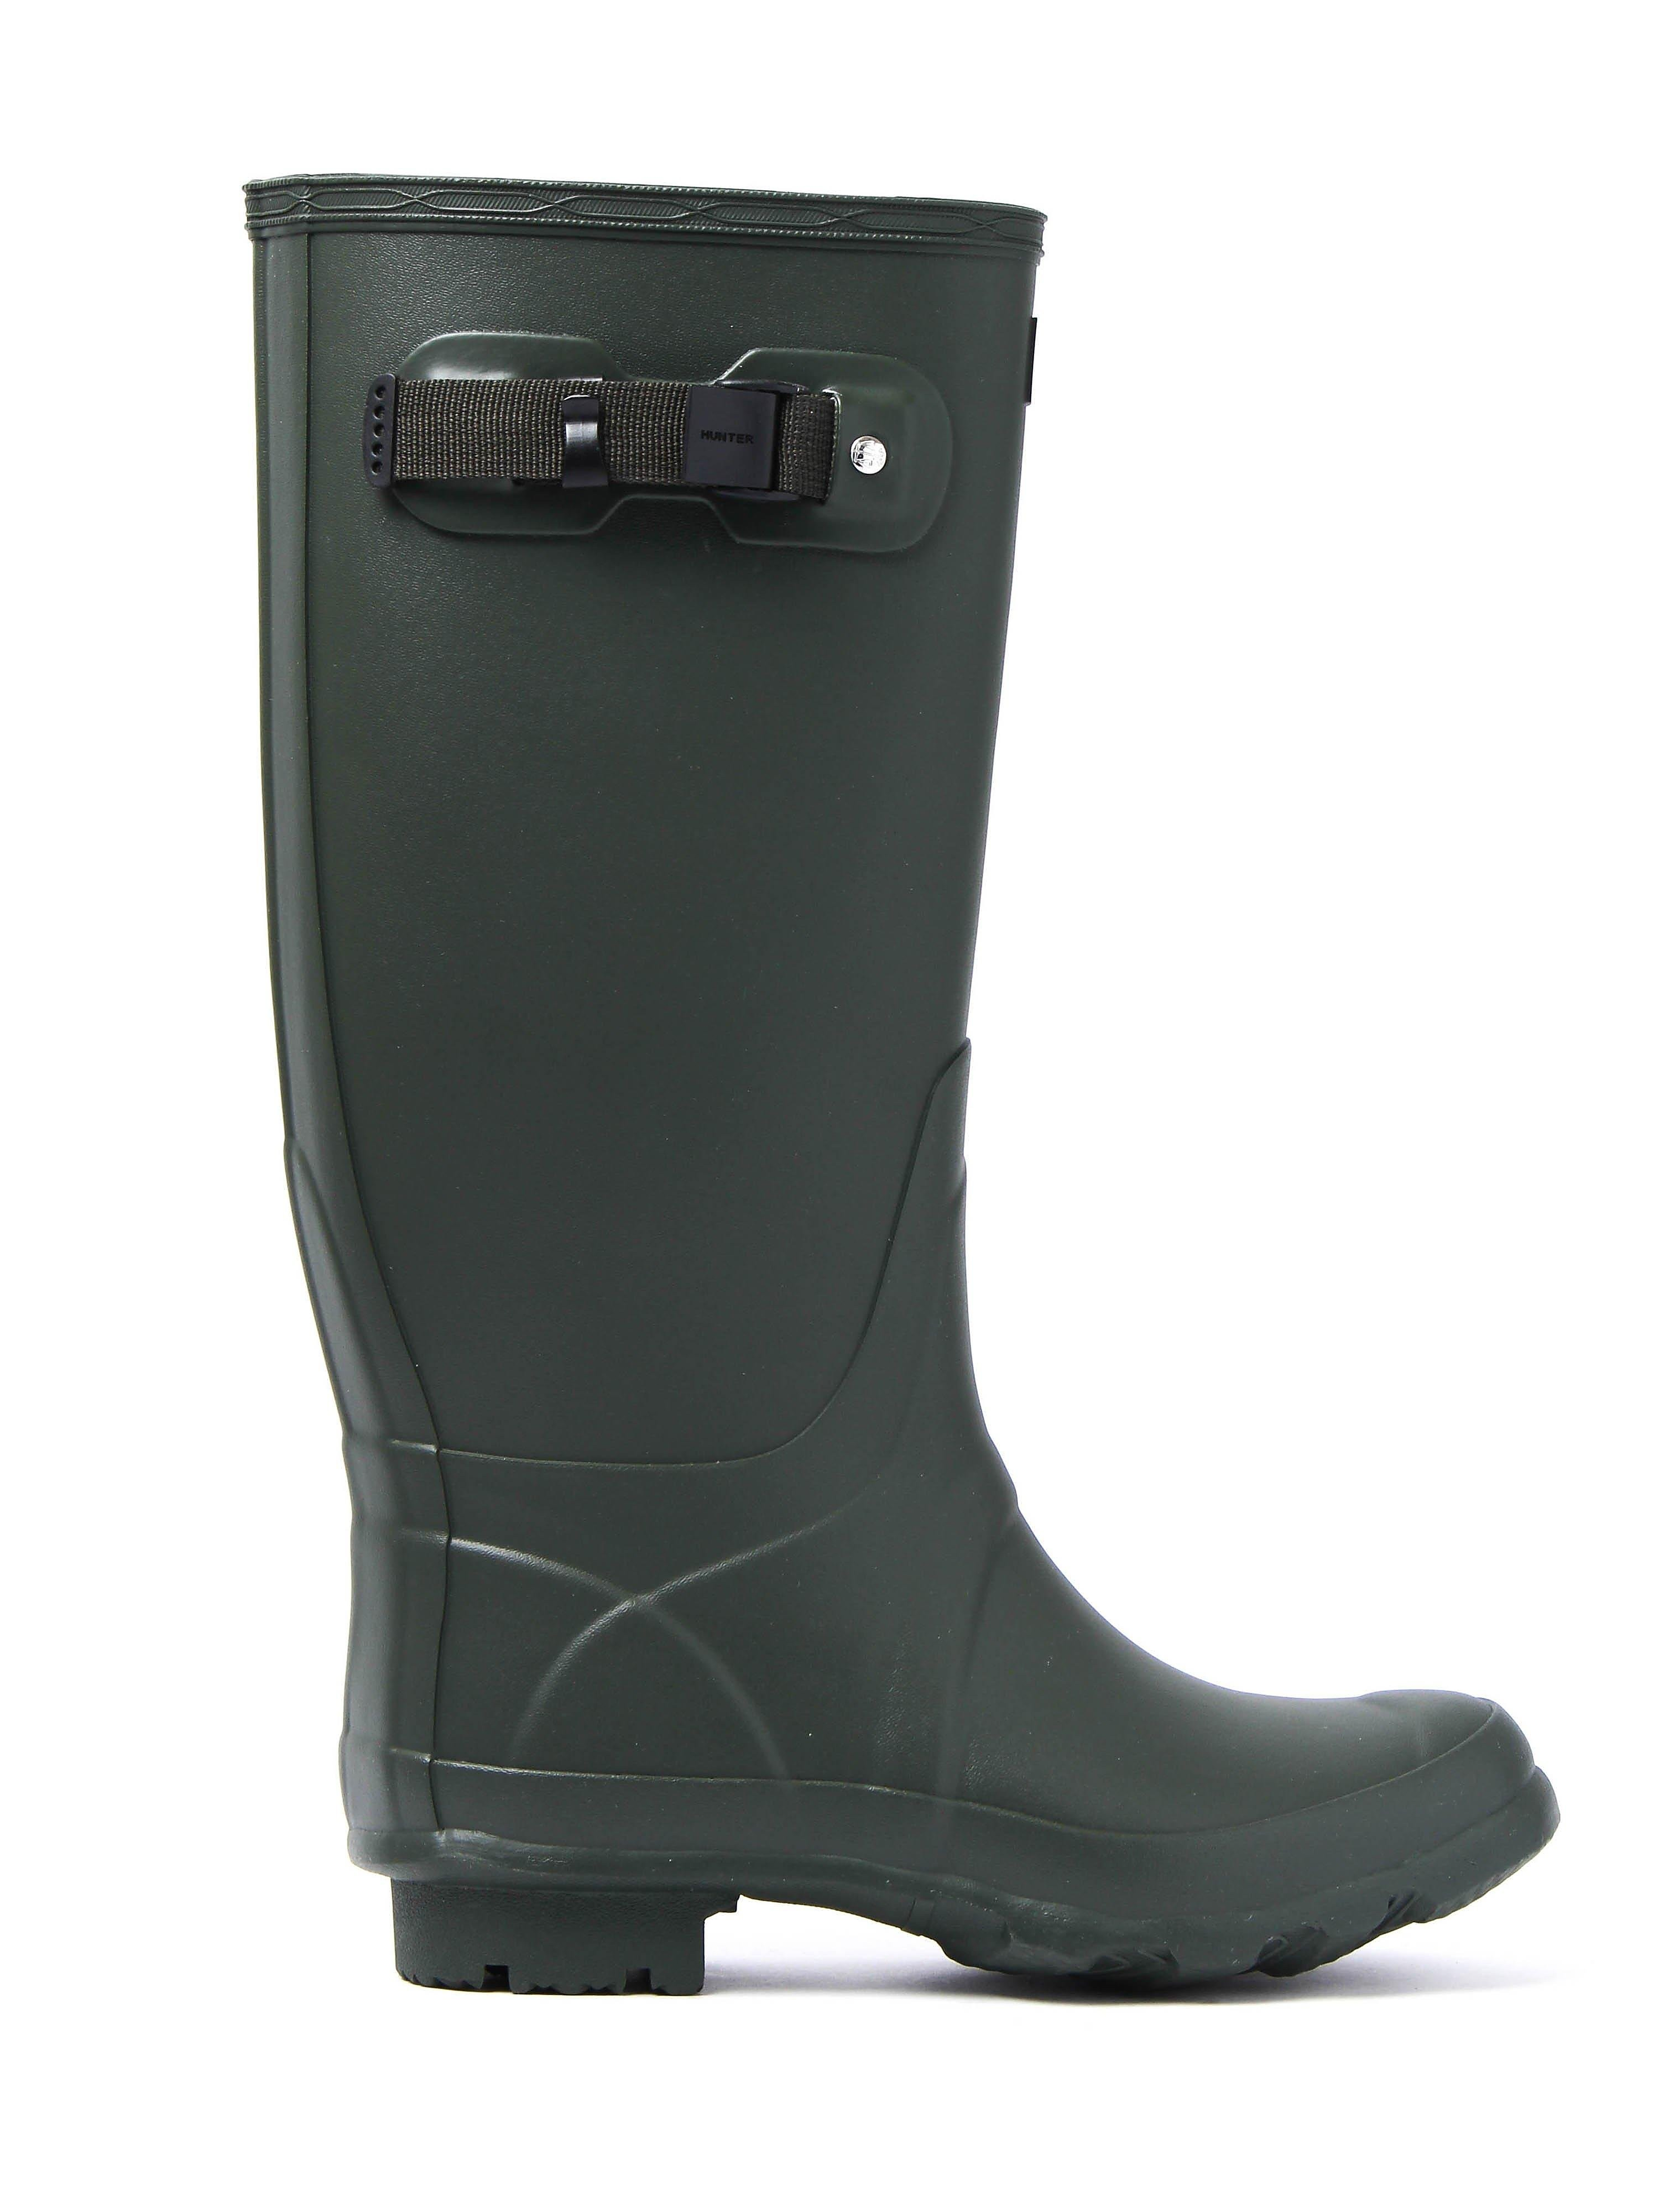 Hunter Wellies Women's Huntress Tall Wellington Boots - Olive